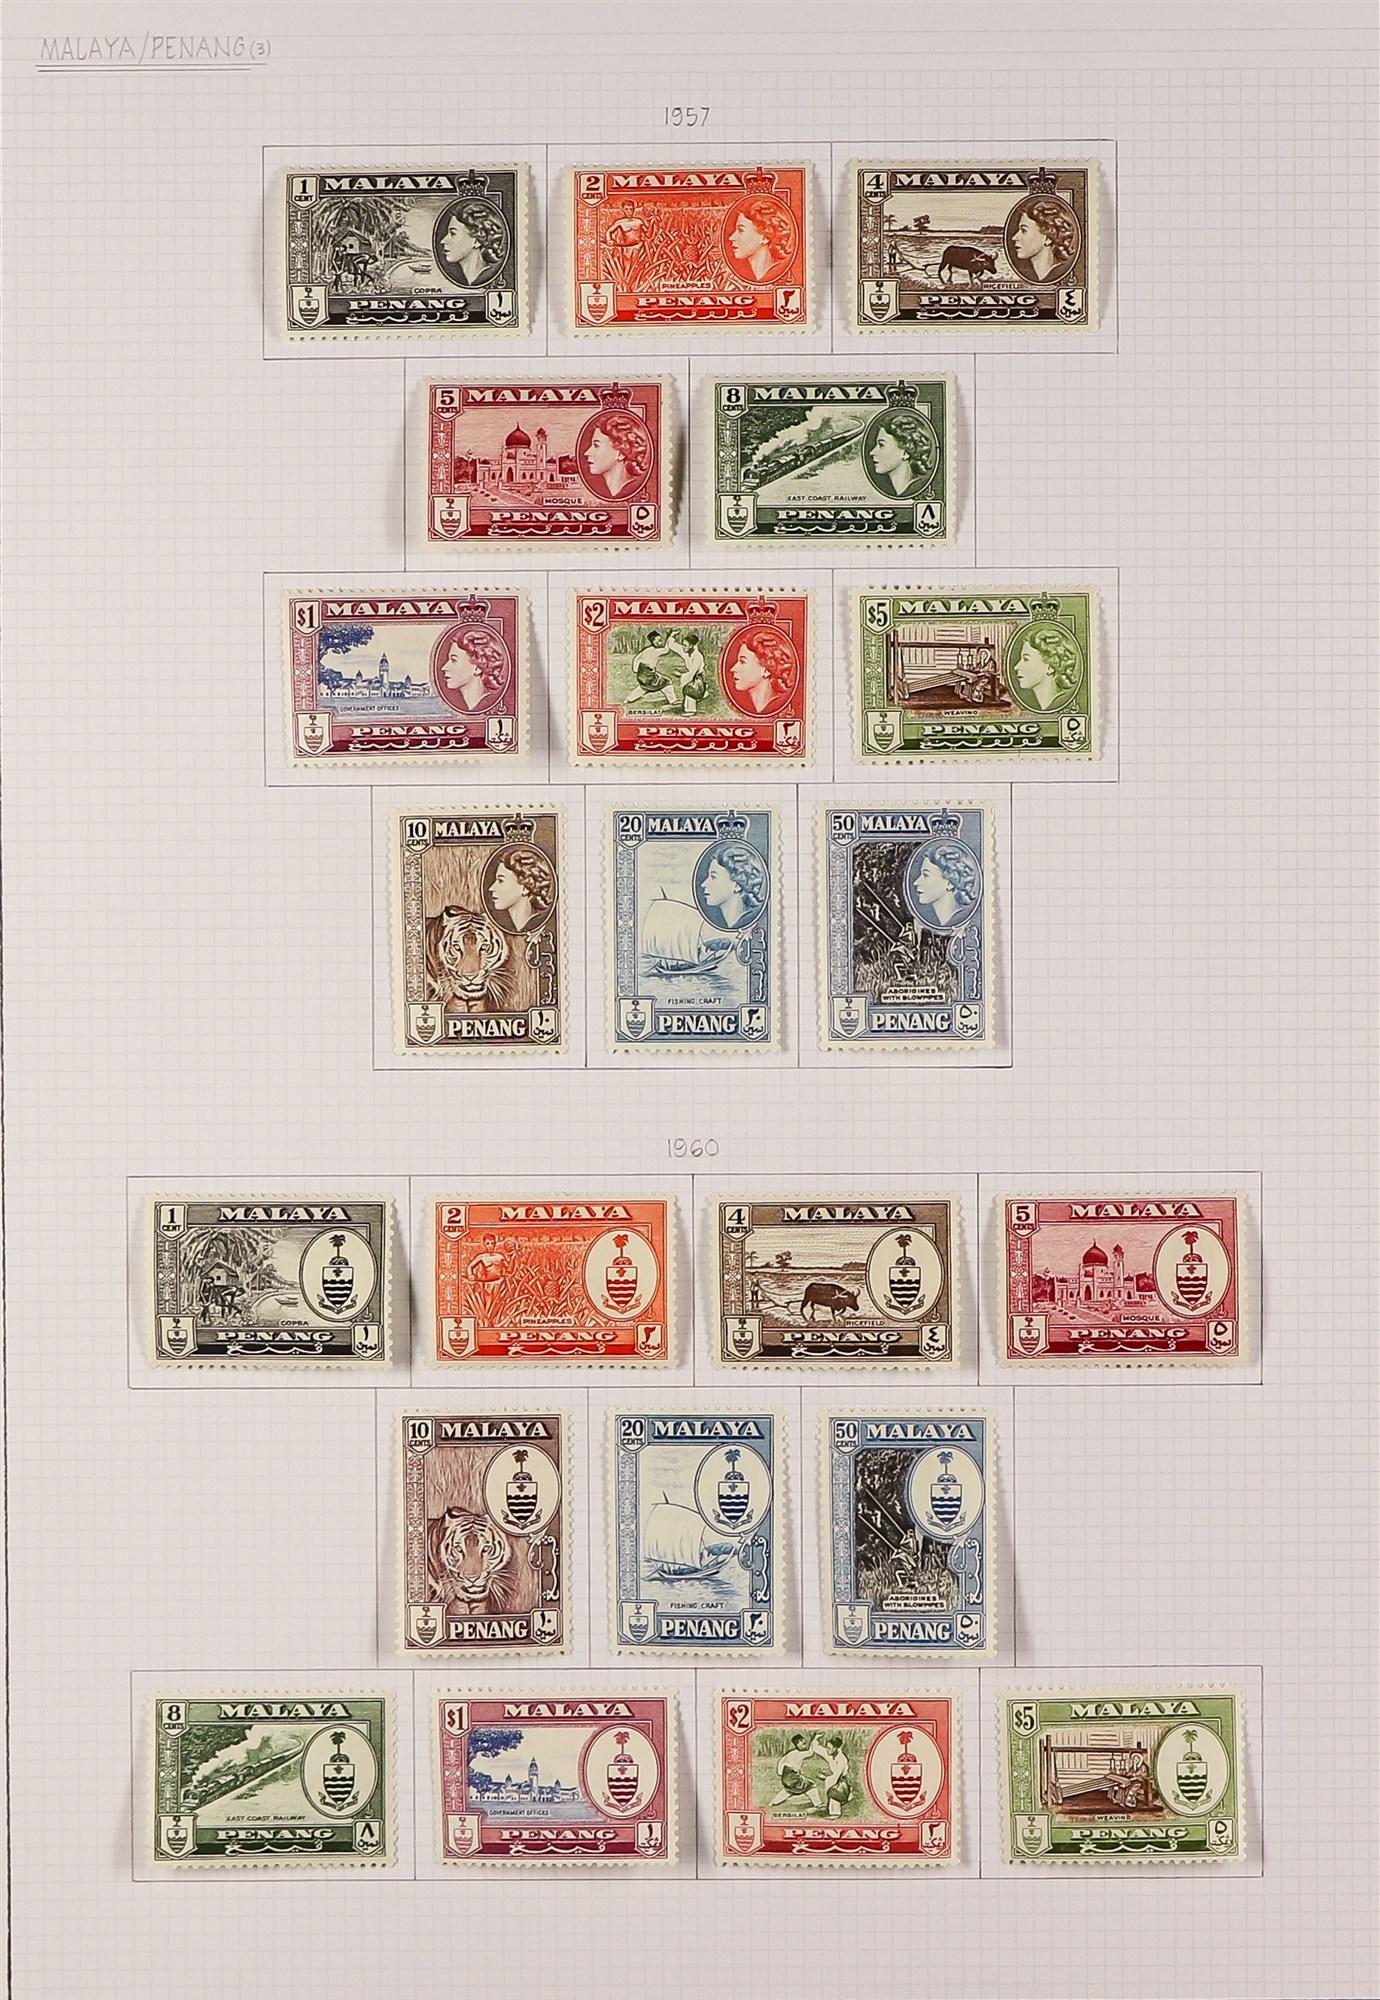 MALAYA STATES PENANG 1953-1960 fine mint complete SG 27/65, includes 1954-57 QEII set, plus4c & - Image 3 of 4